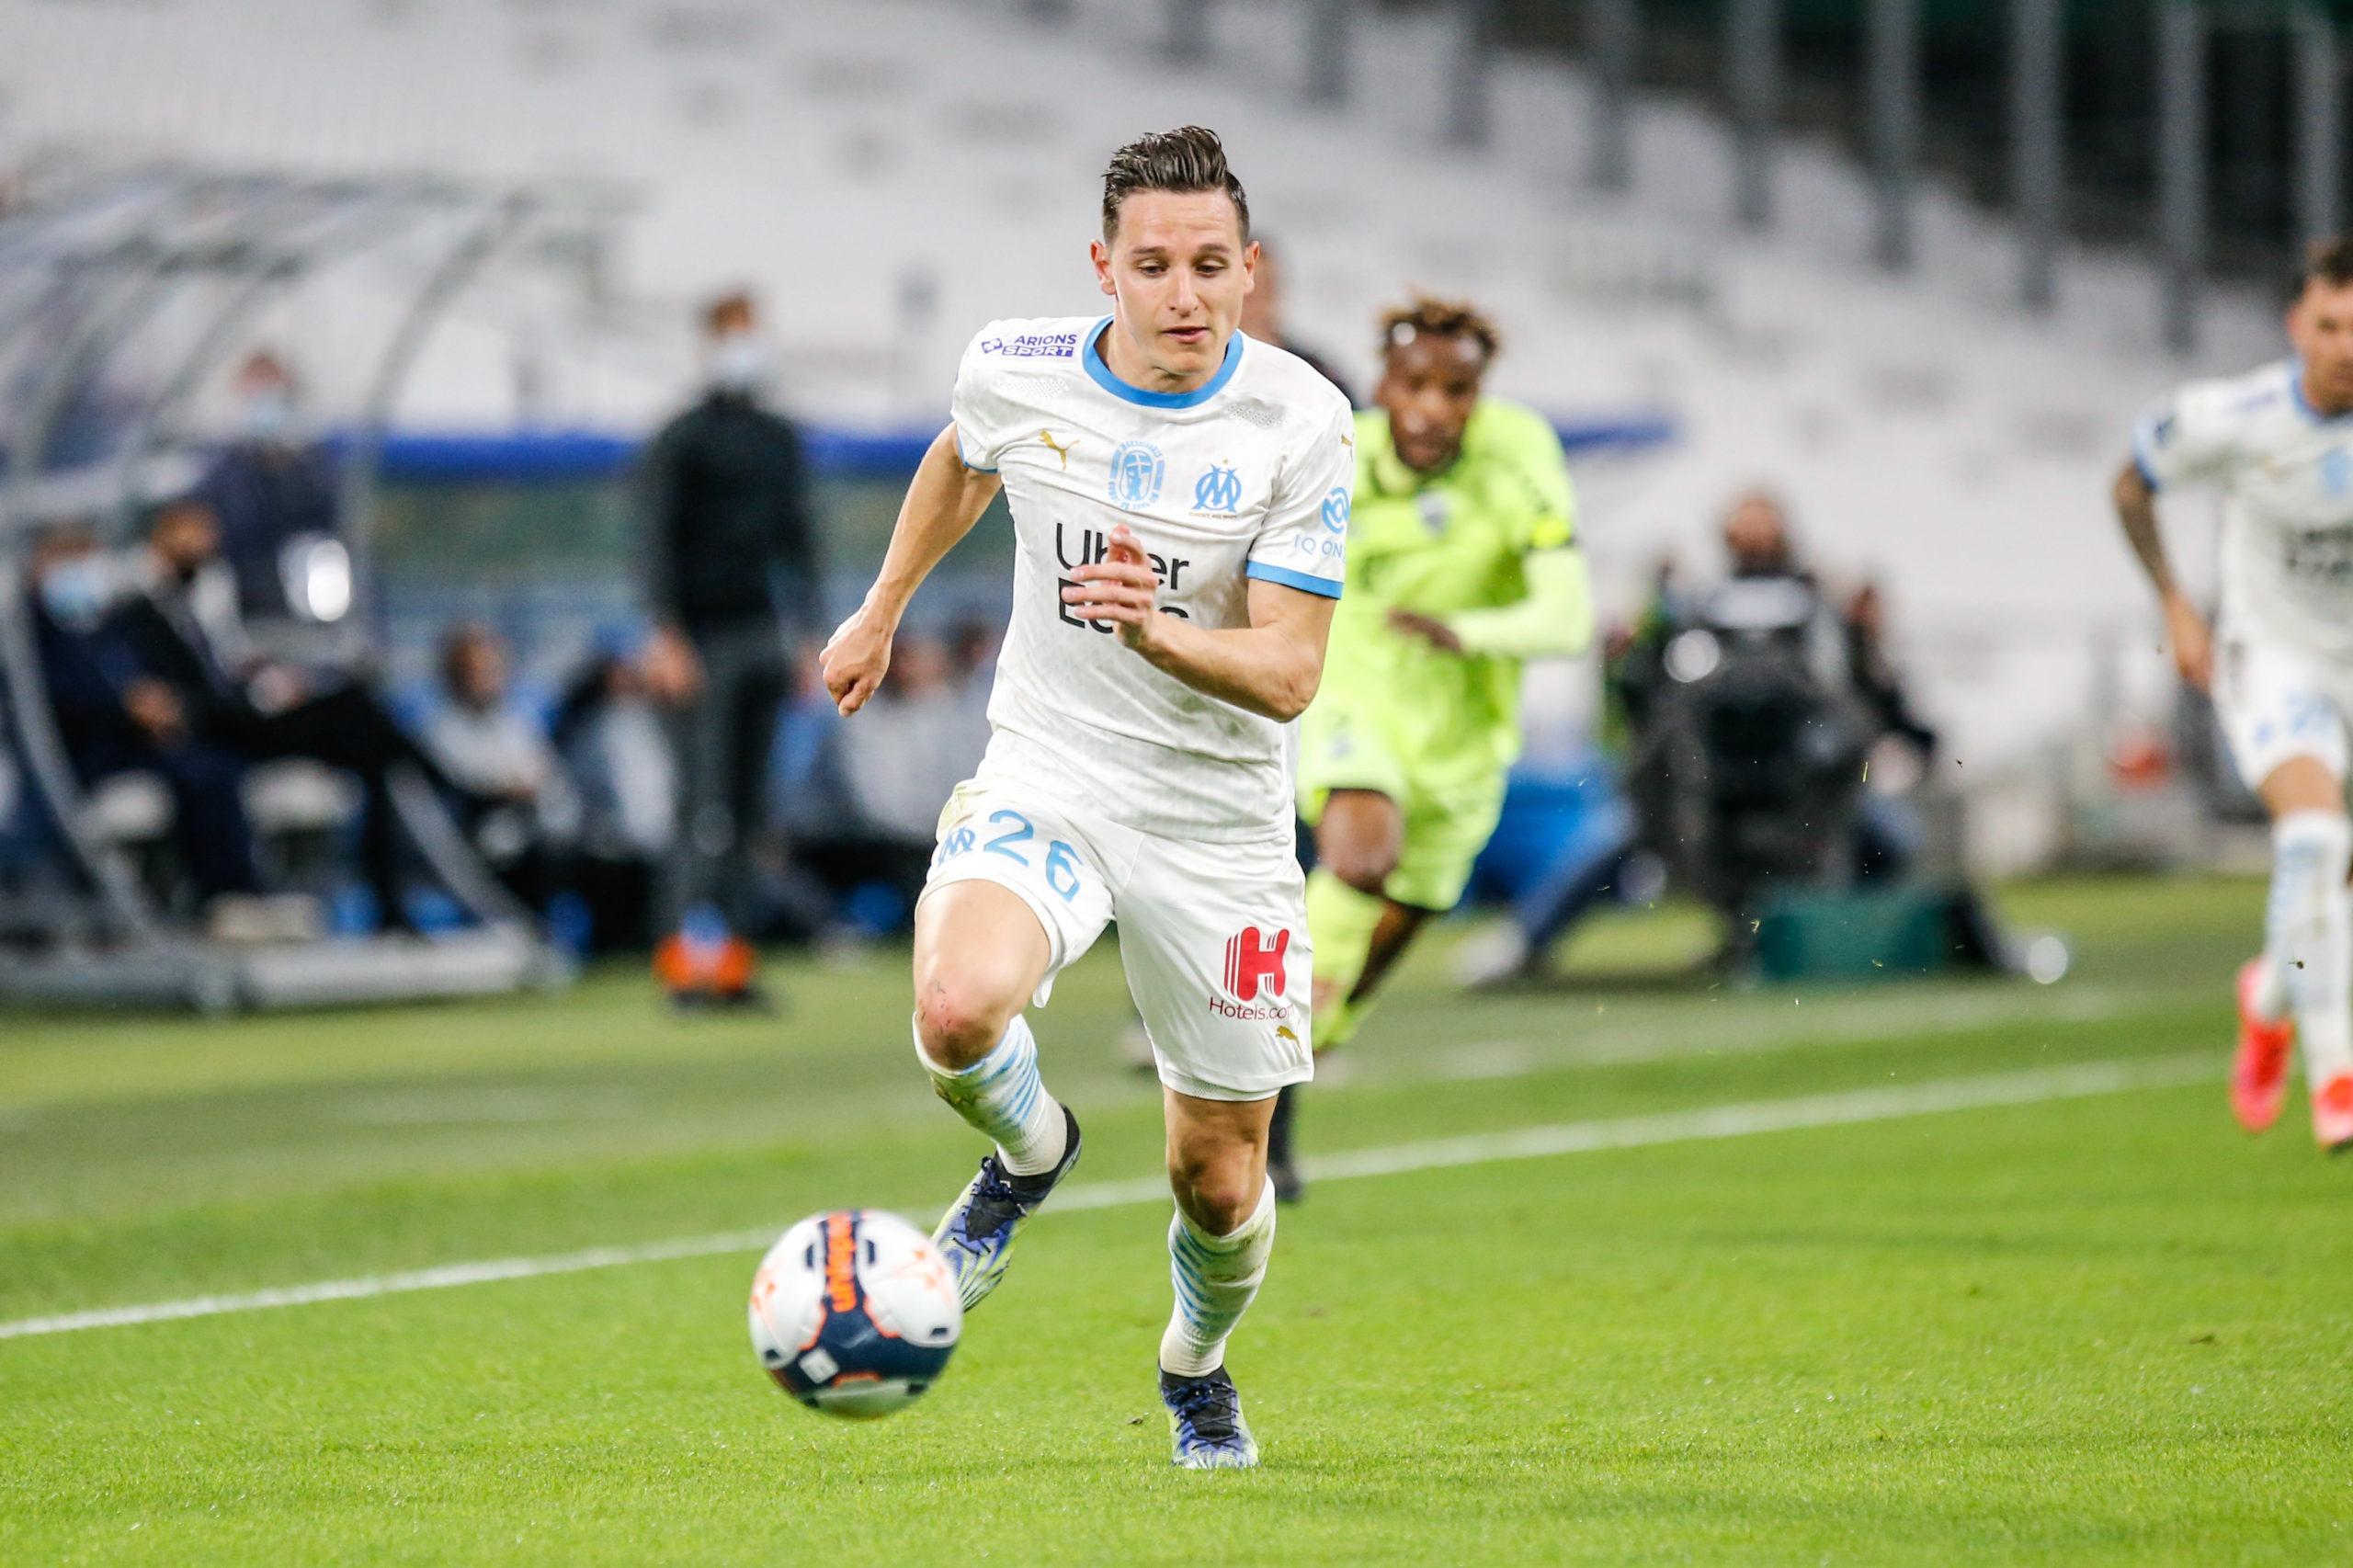 Mercato OM : Thauvin reste à Marseille ! Nabil Djellit l'affirme